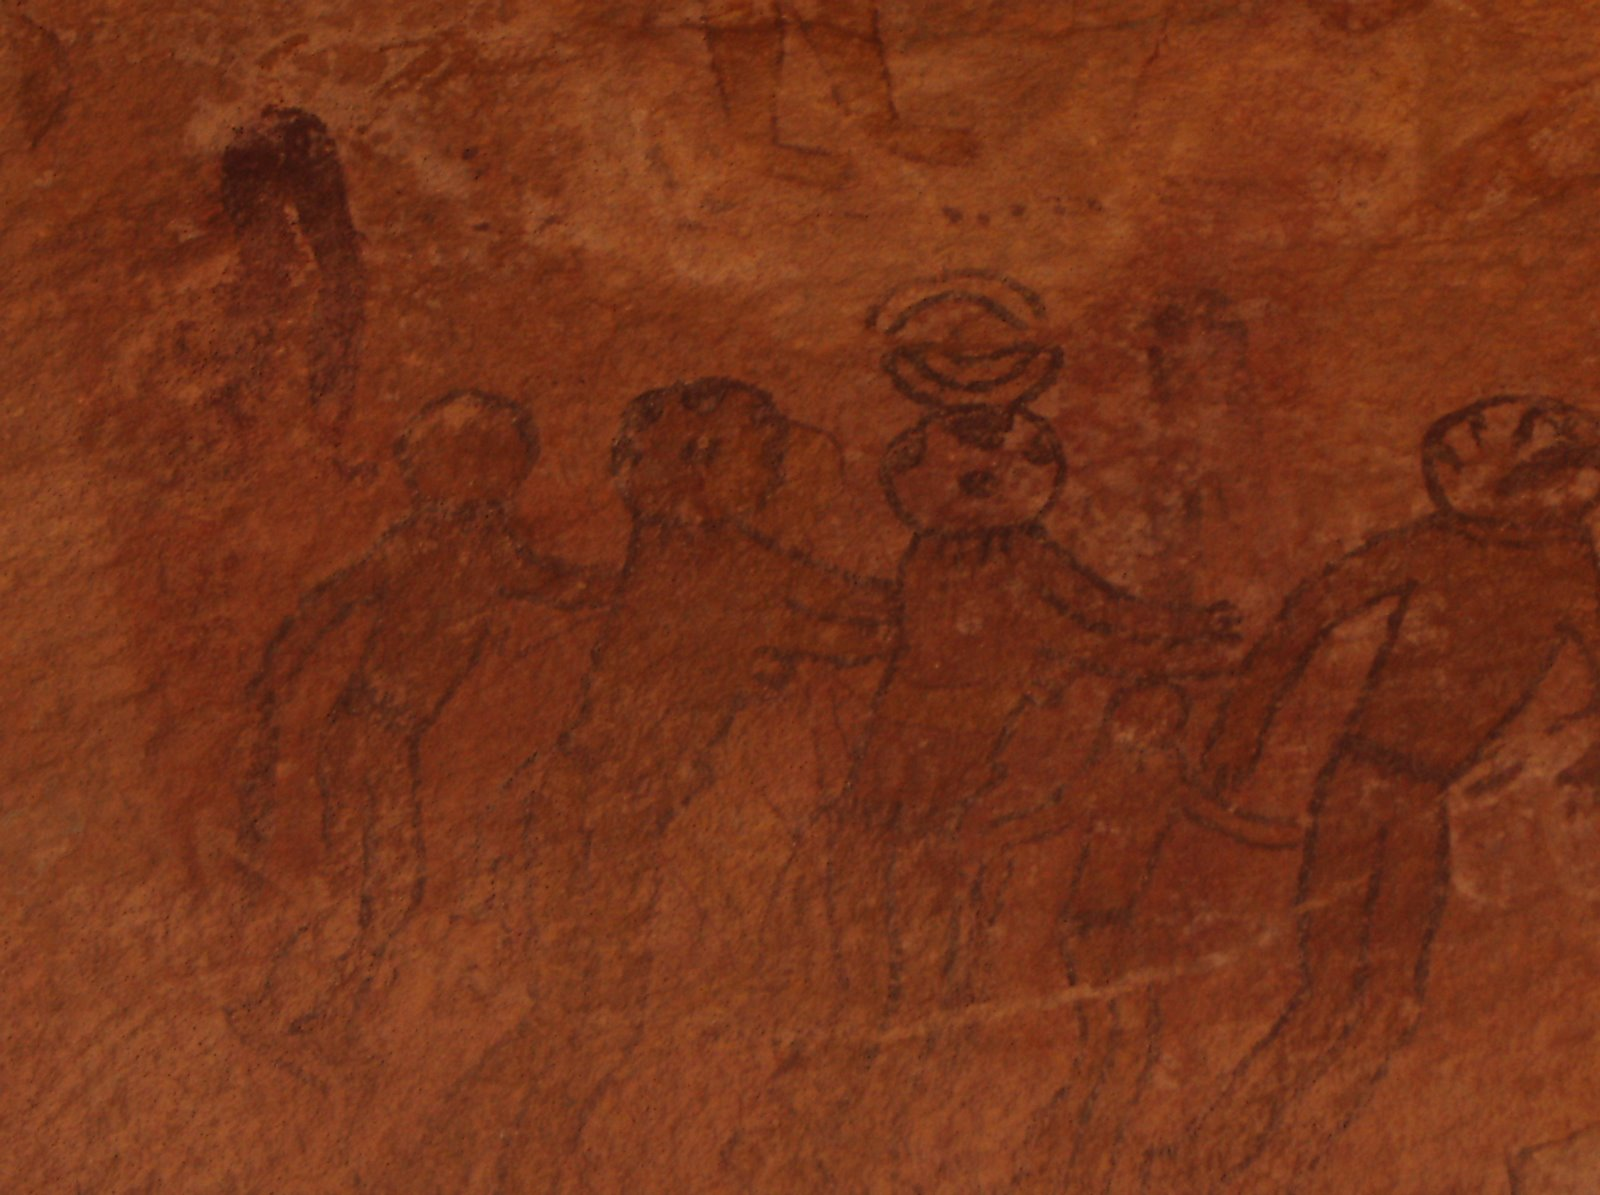 Desierto de Mojave - Wikipedia, la enciclopedia libre